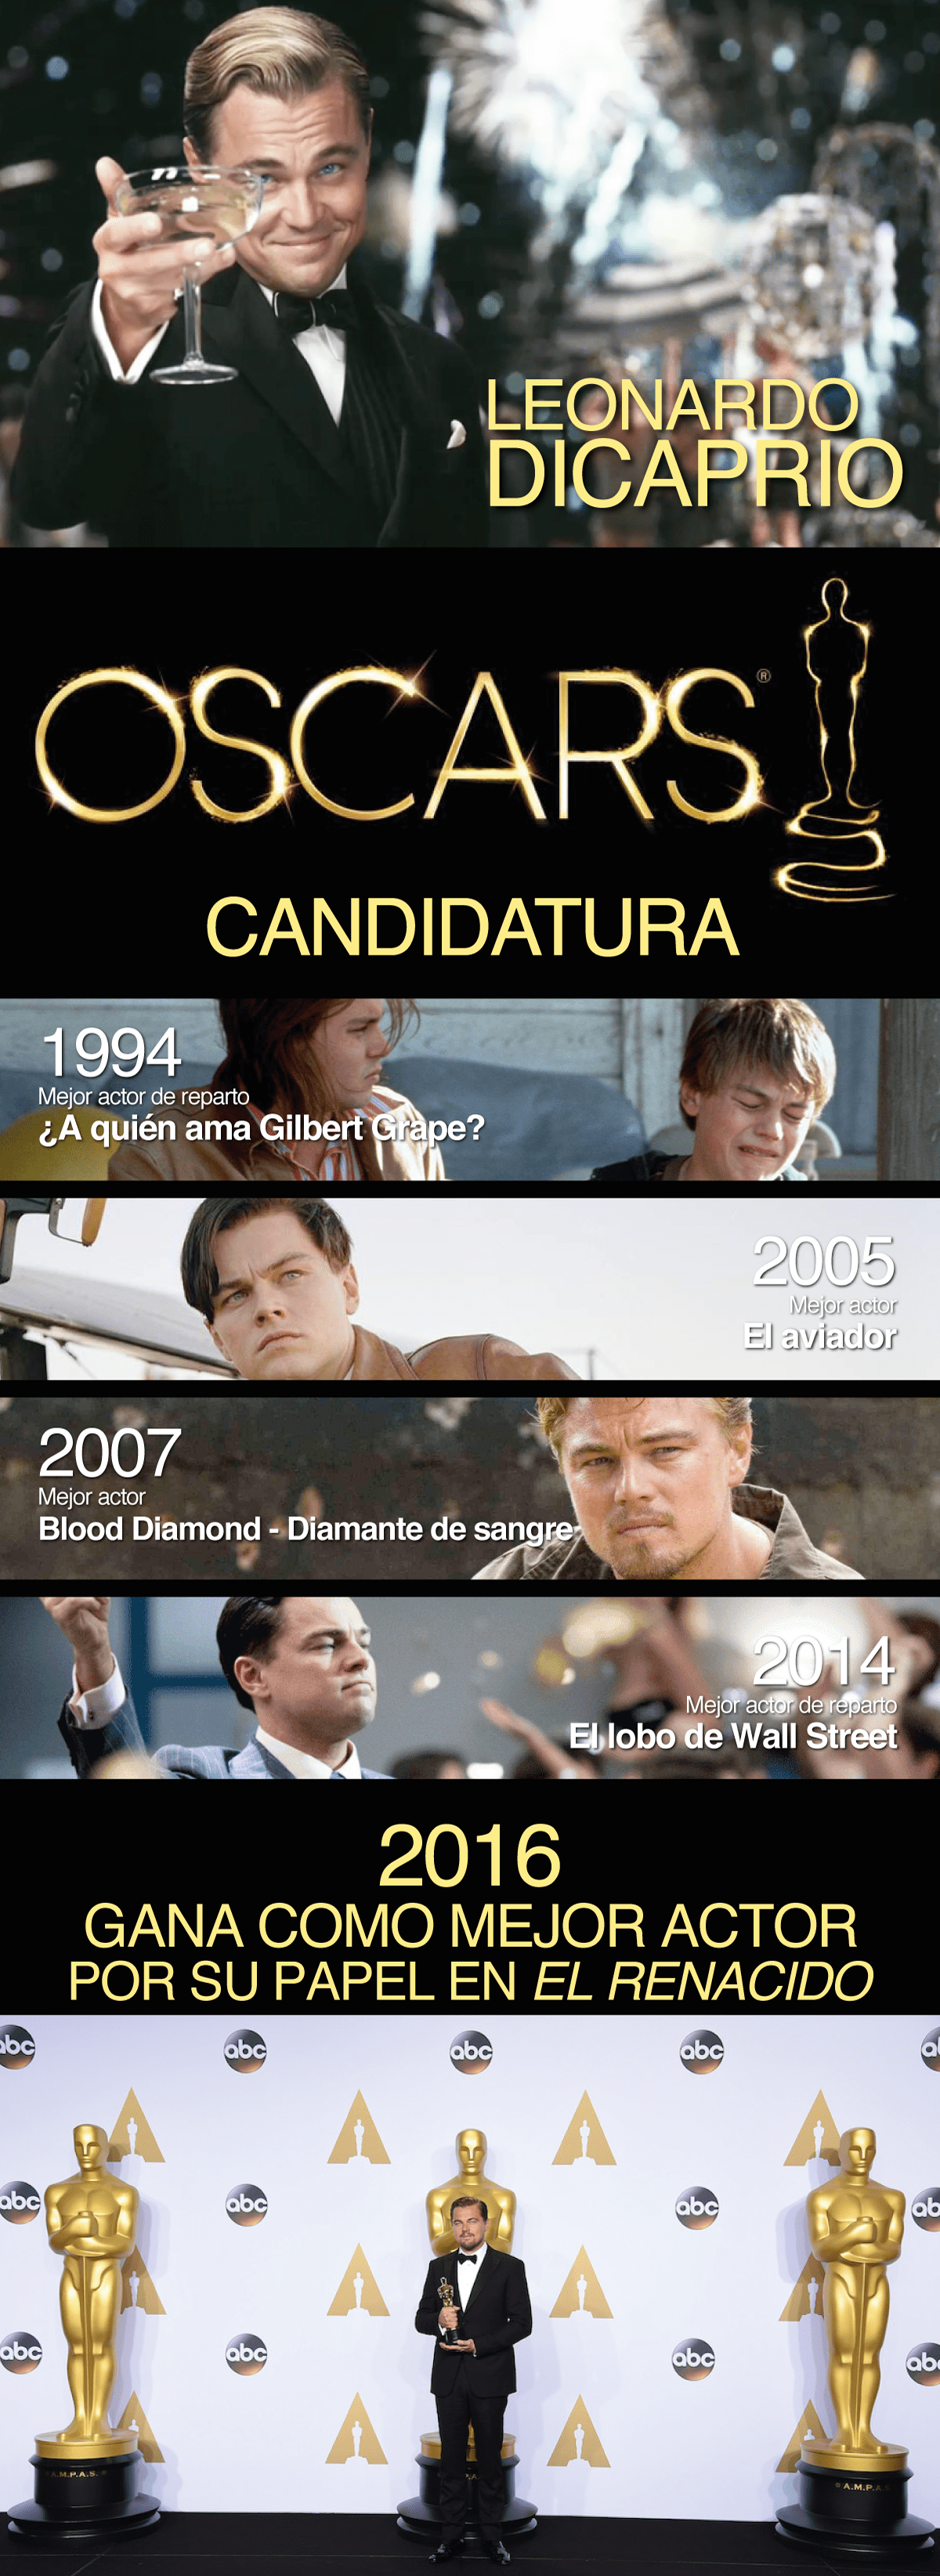 Infografía de Leonardo Dicaprio